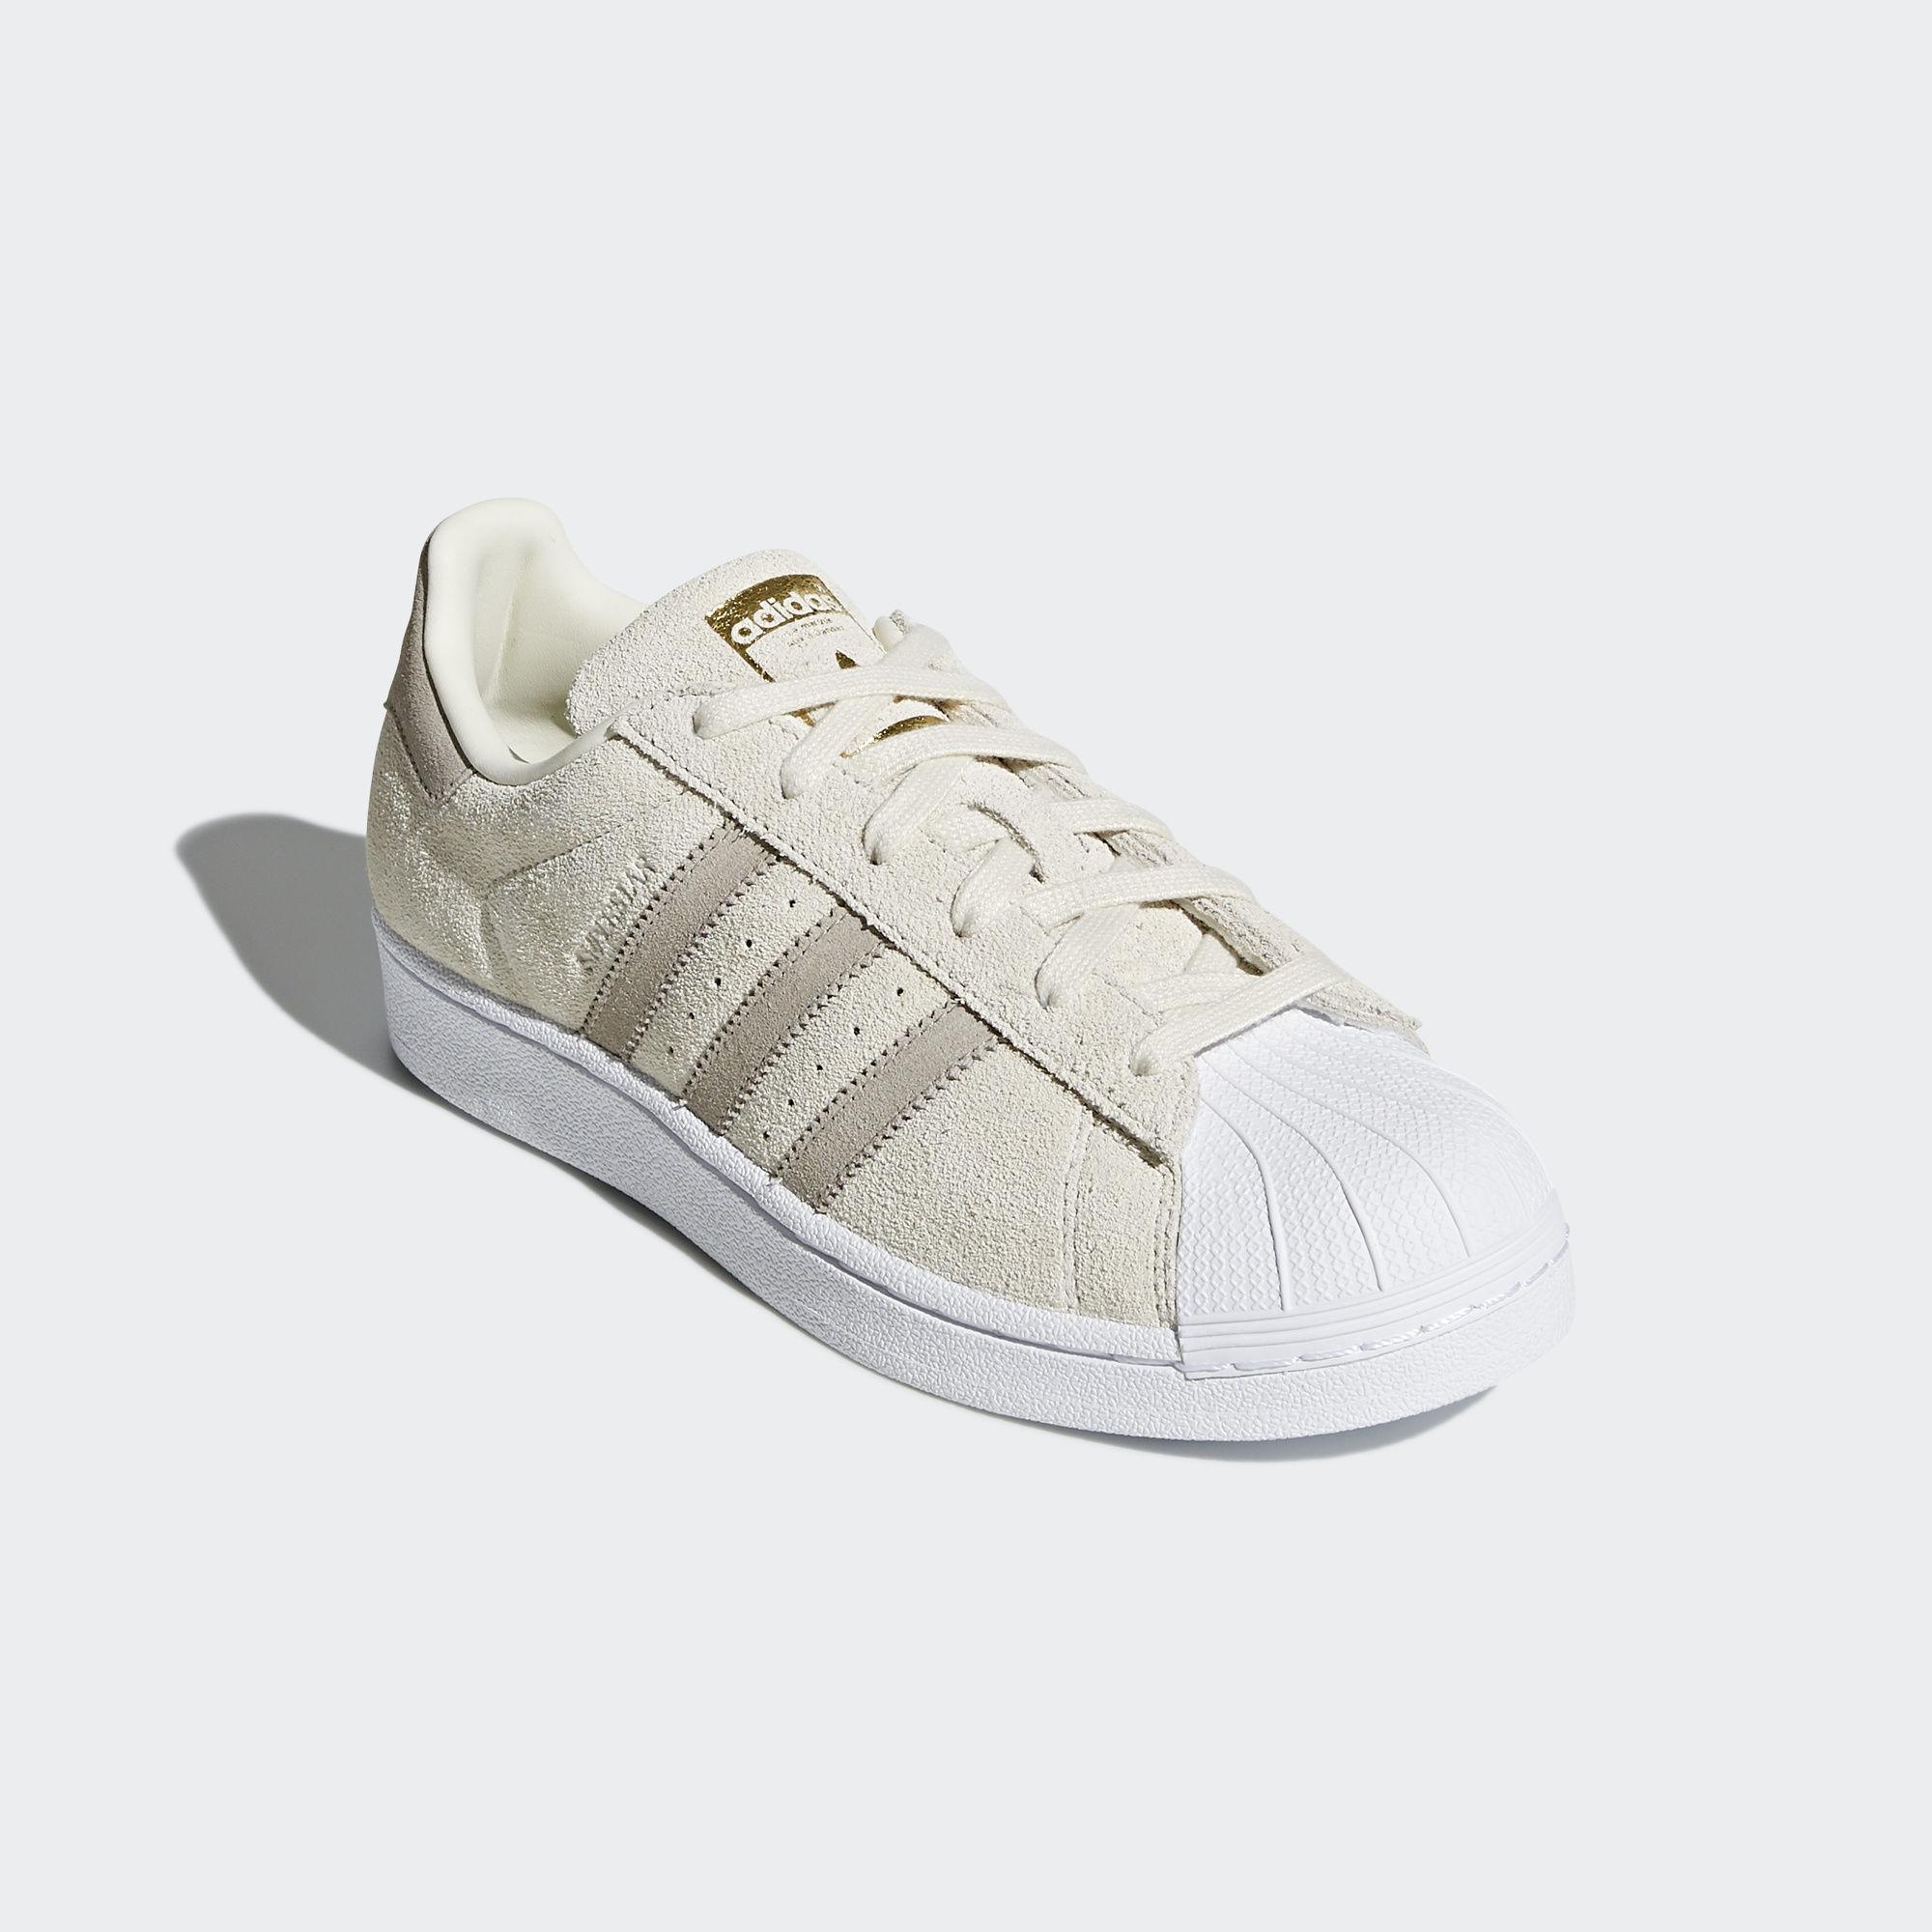 Superstar W CG5459 Adidas Originals